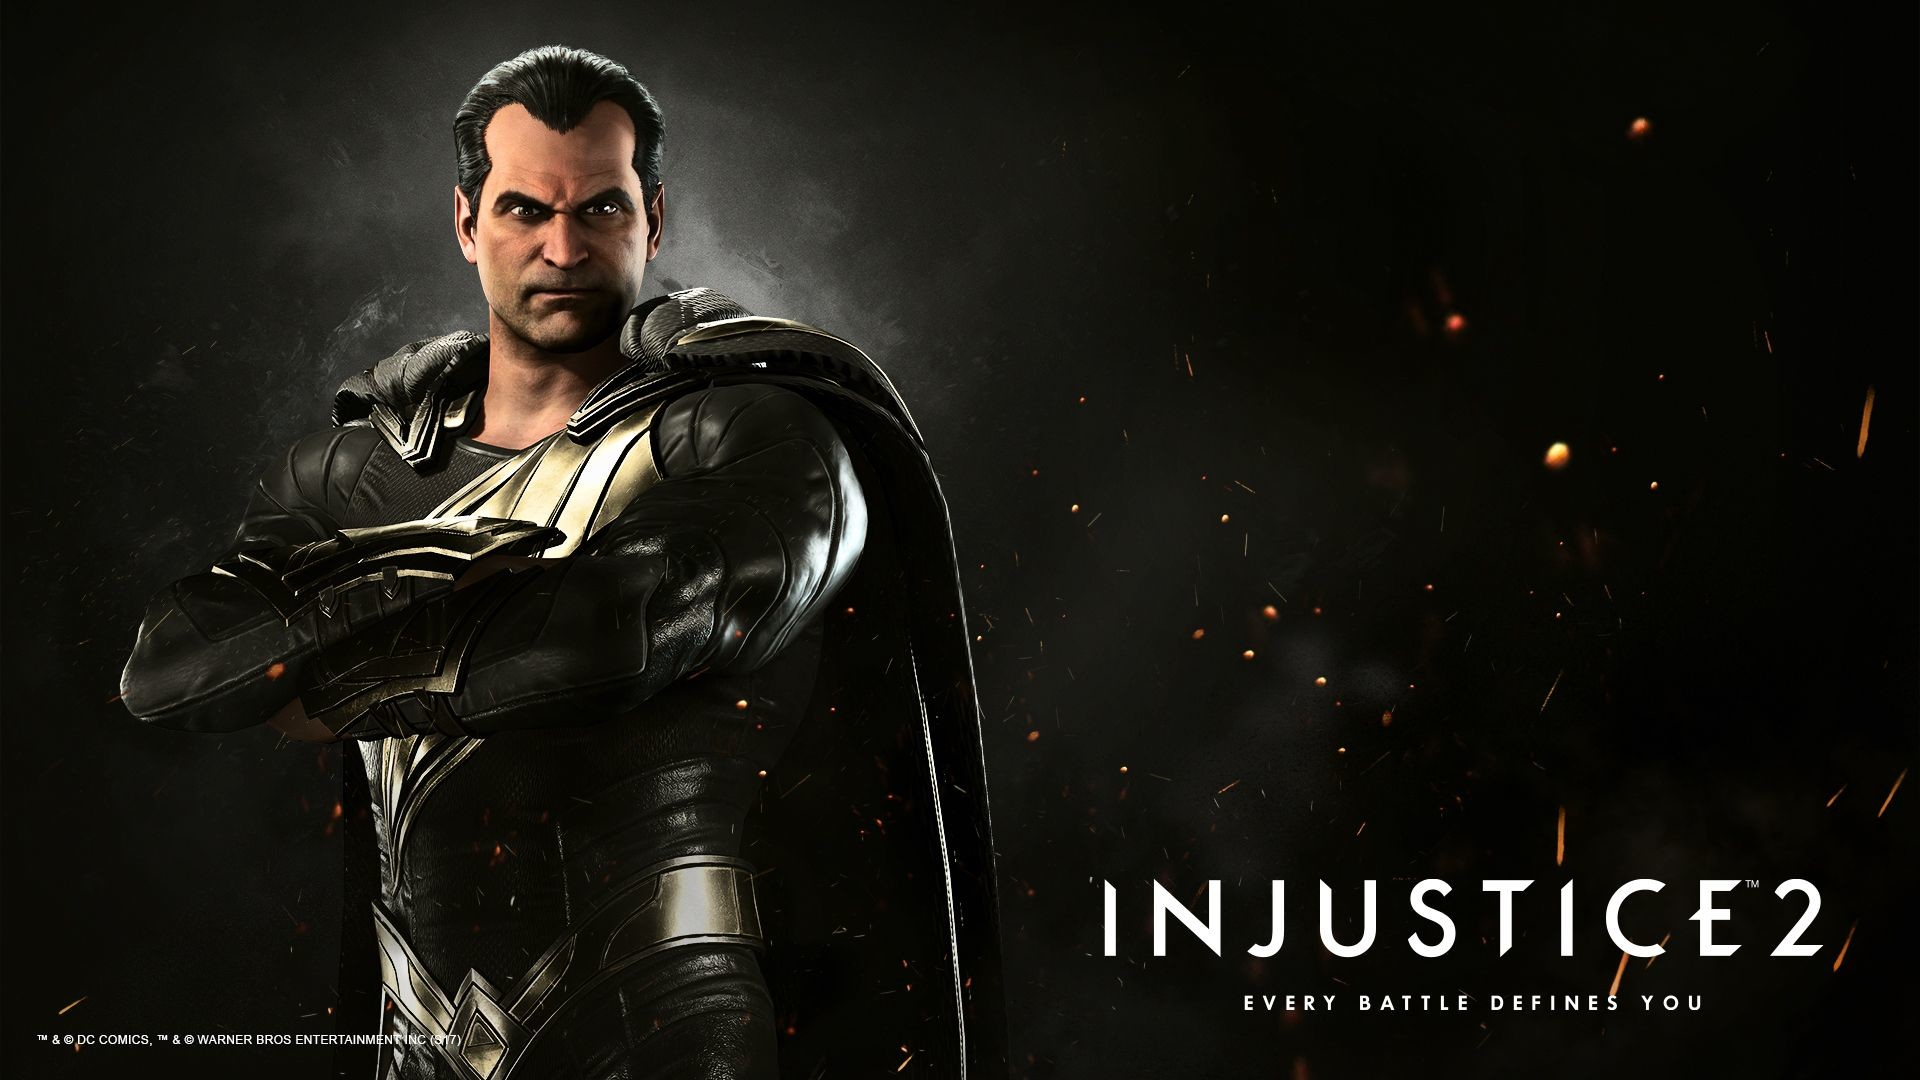 Res: 1920x1080, Black Adam Injustice 2 Wallpaper 0001.jpg